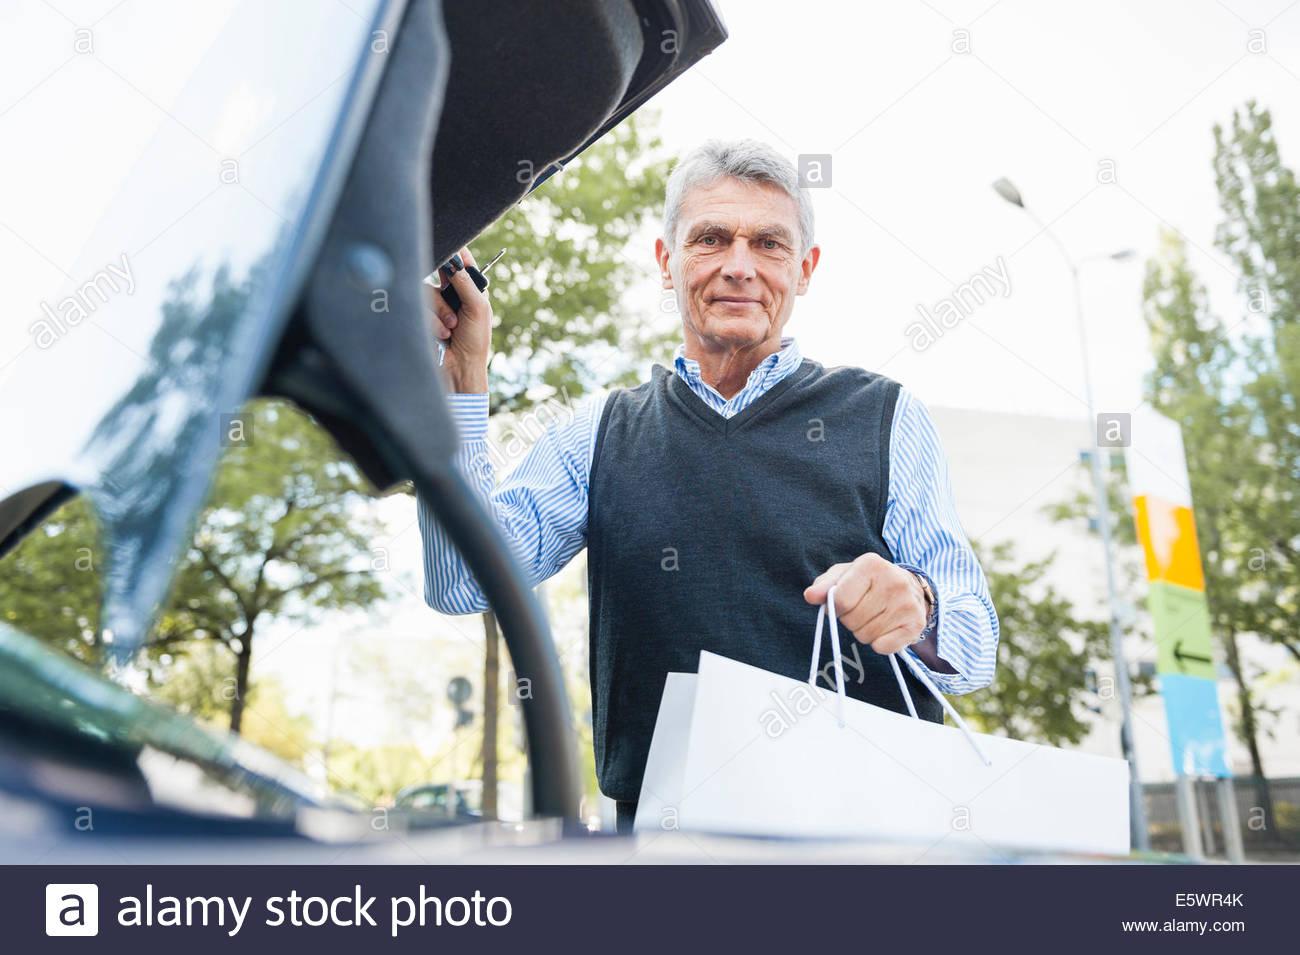 Senior adult businessman putting bag in car boot - Stock Image